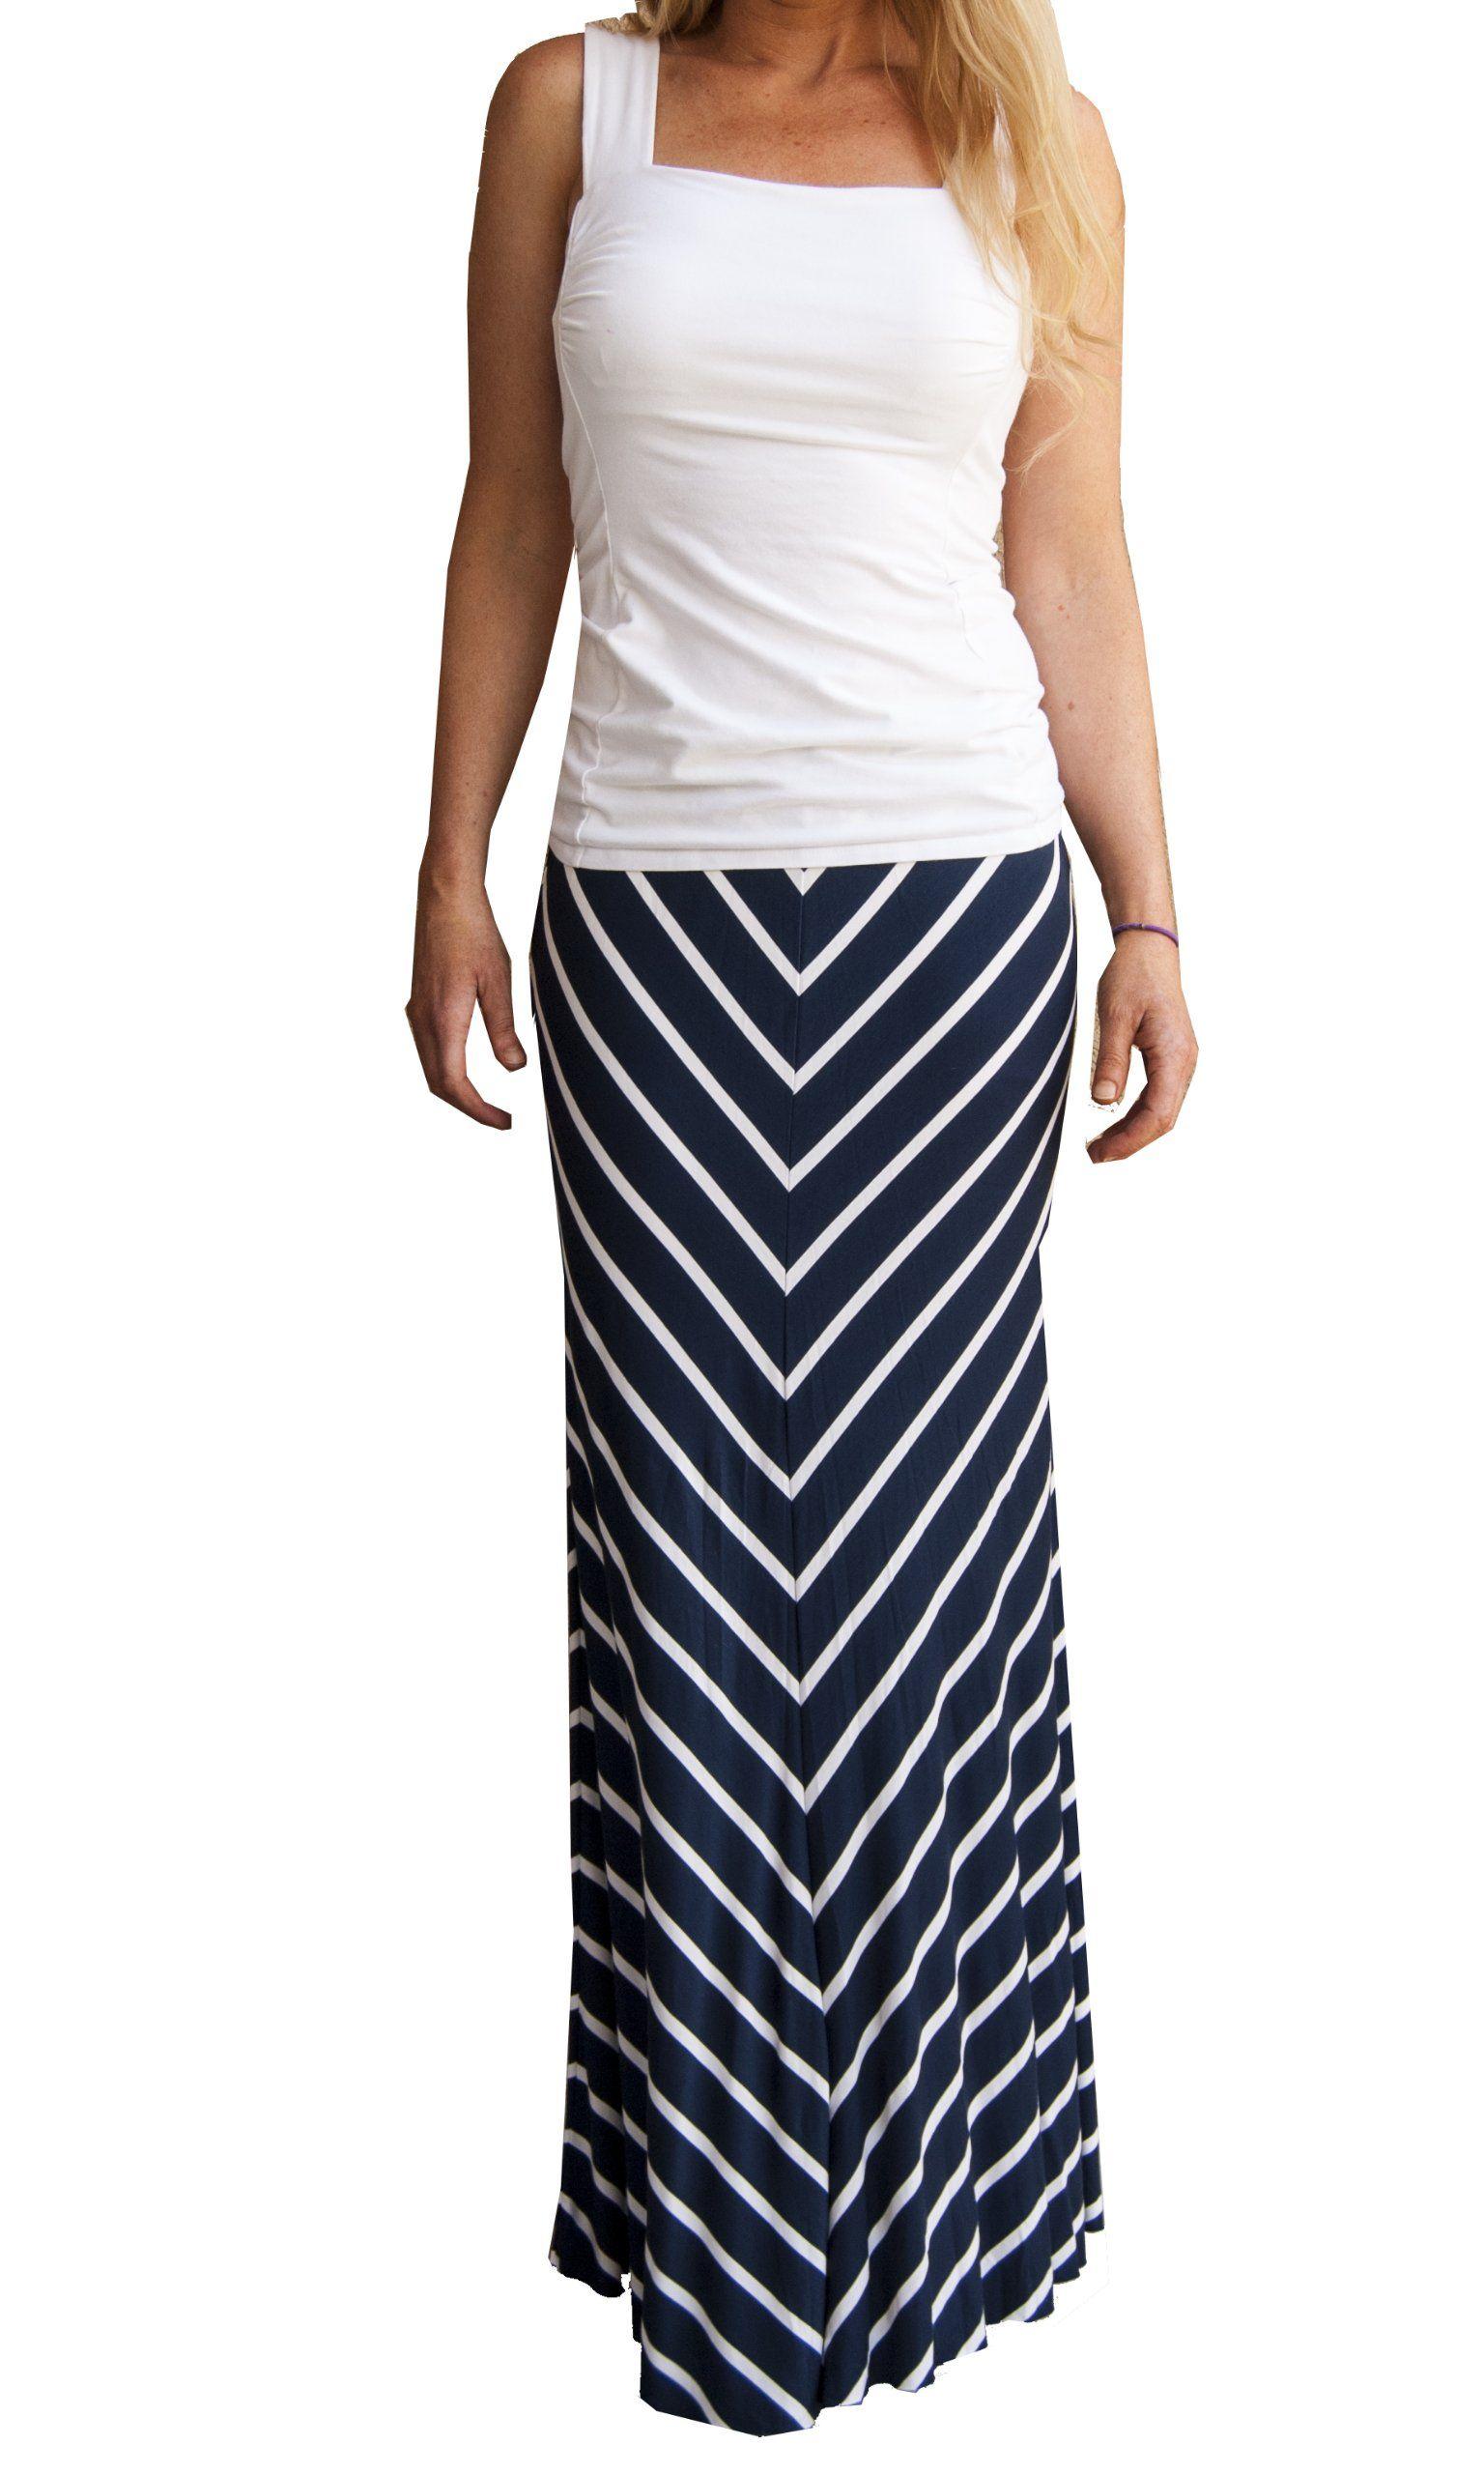 cb747c81721284 On Trend Women s Navy and White Chevron V Lined Long Soft Striped Maxi Skirt  (S)